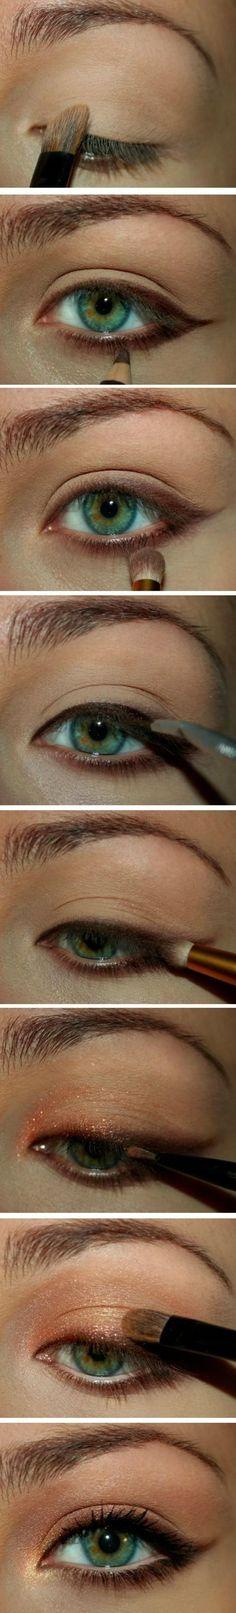 Makeup - I  #2087529